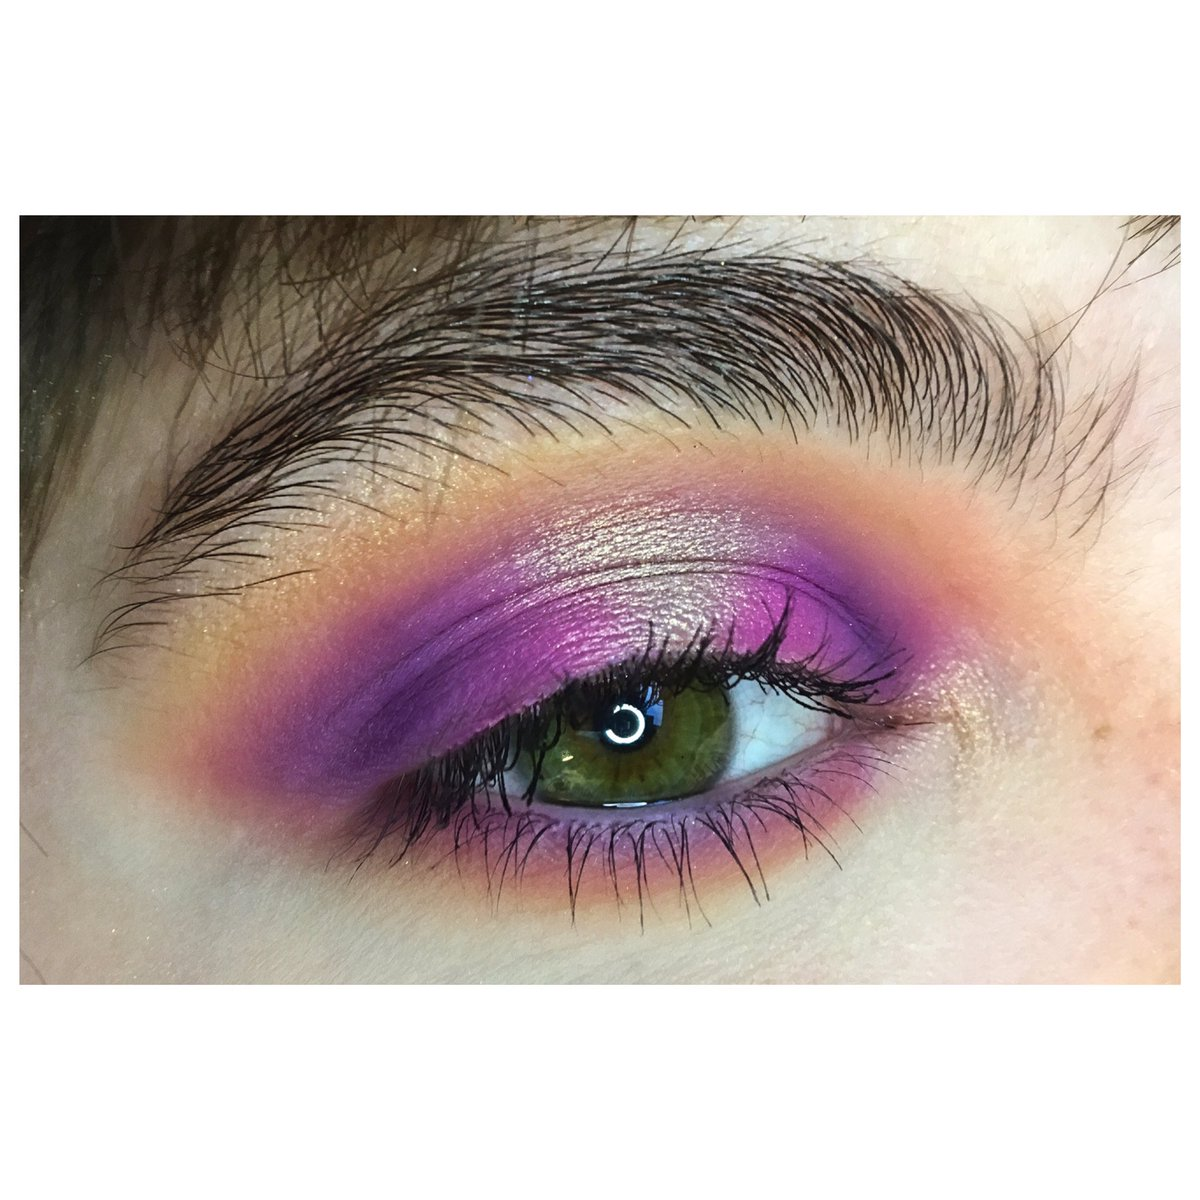 Halo   Palette Jackie Aina @ABHcosmetics  Palette Artistry @MorpheBrushes   RT svp #morphebabe #makeup #abh #abhxjackieaina #morphepic.twitter.com/x9EIq5bLD5